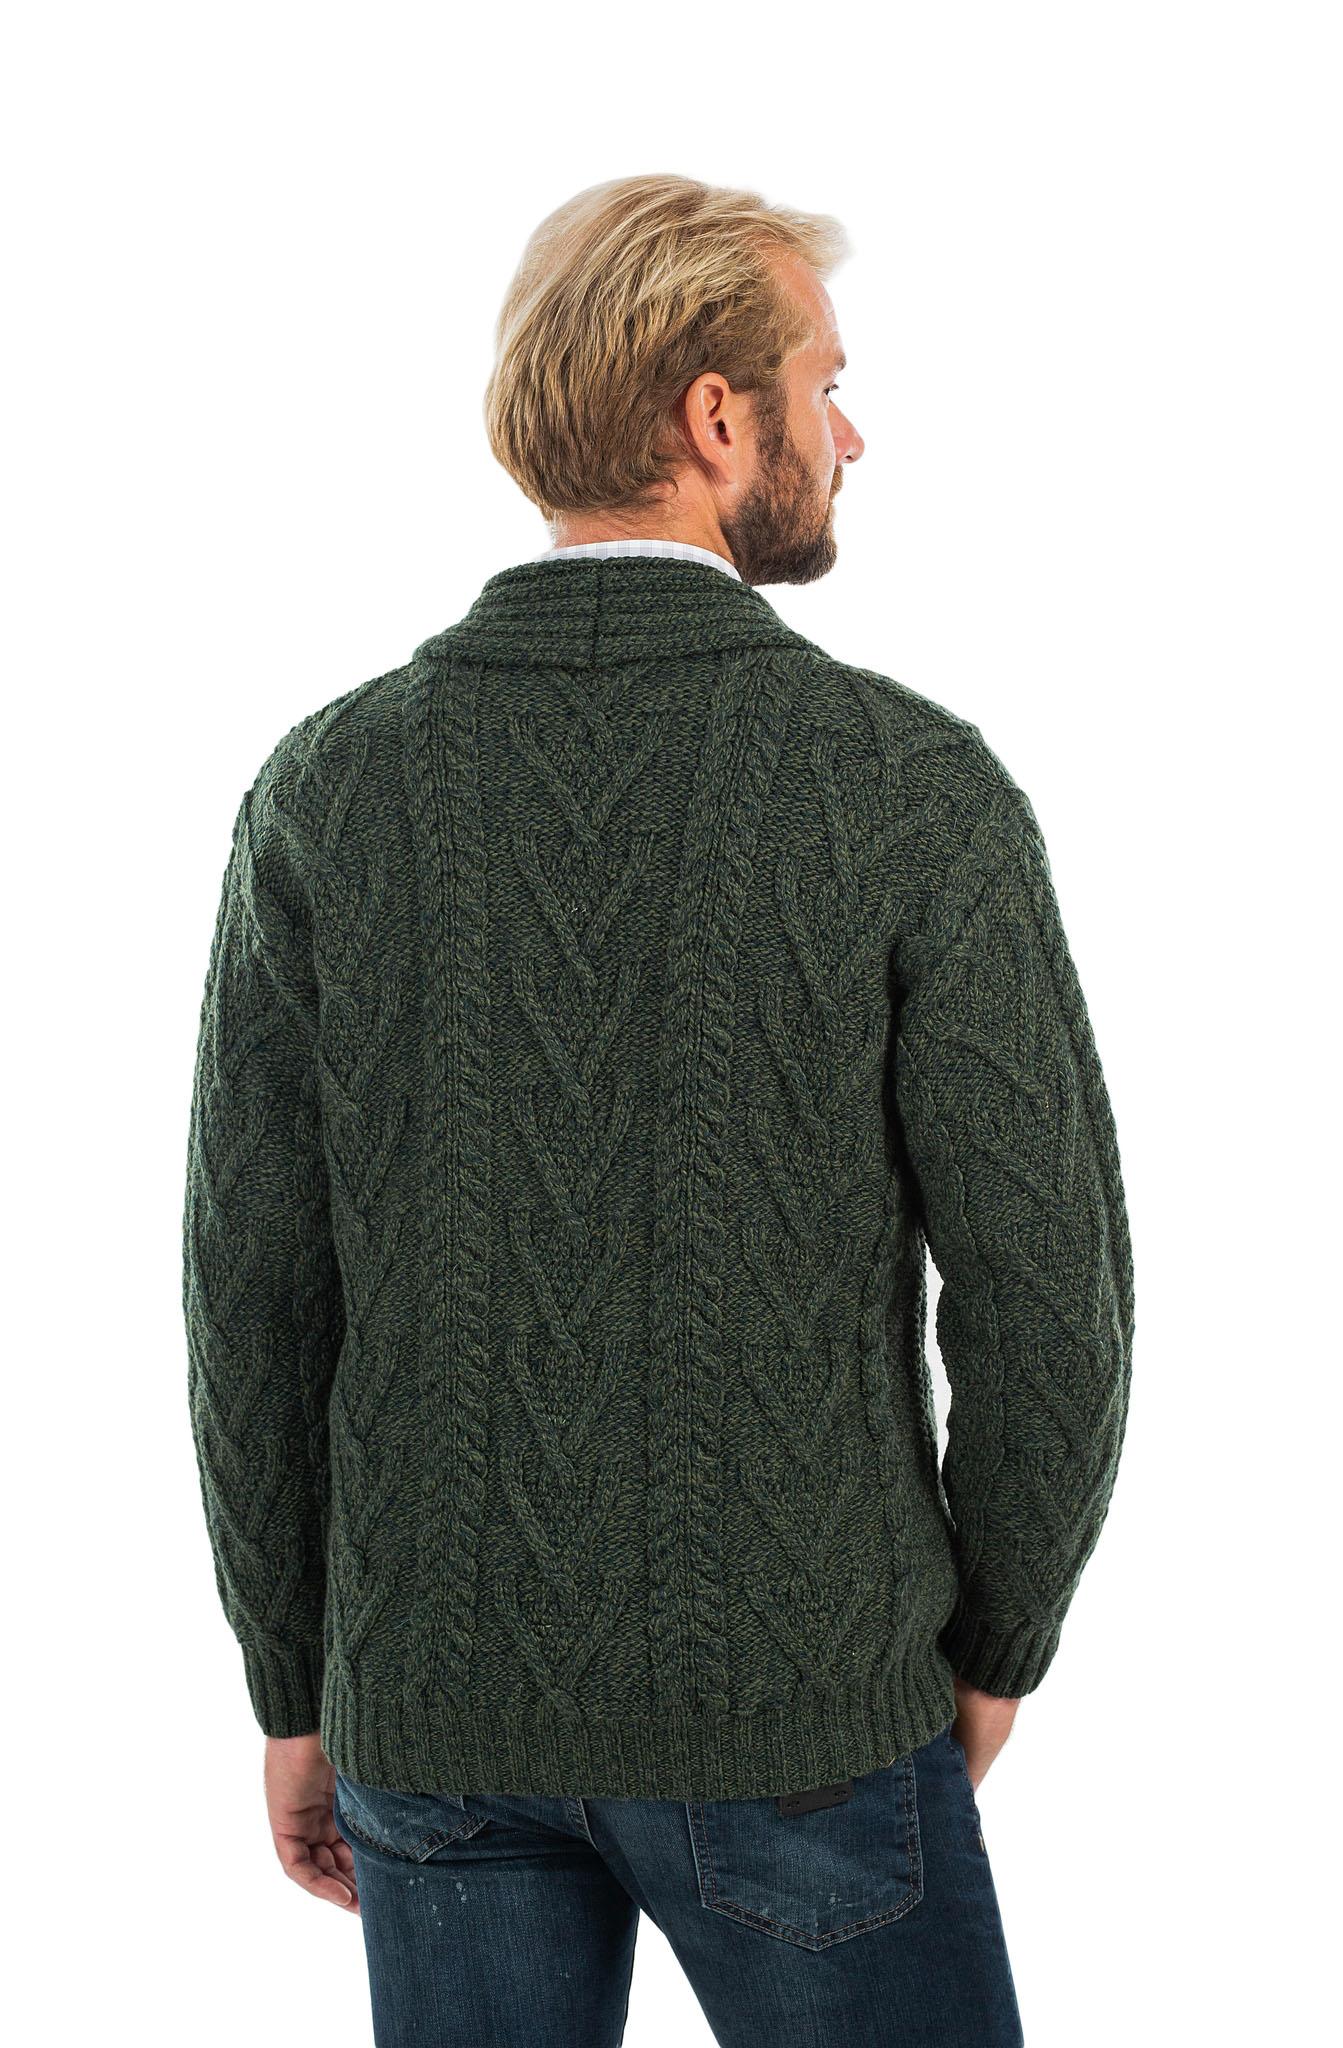 SAOL-Mens-Irish-Merino-Wool-Cardigan-Shawl-Collar-Front-Pockets-Aran-Cable-Knit thumbnail 11